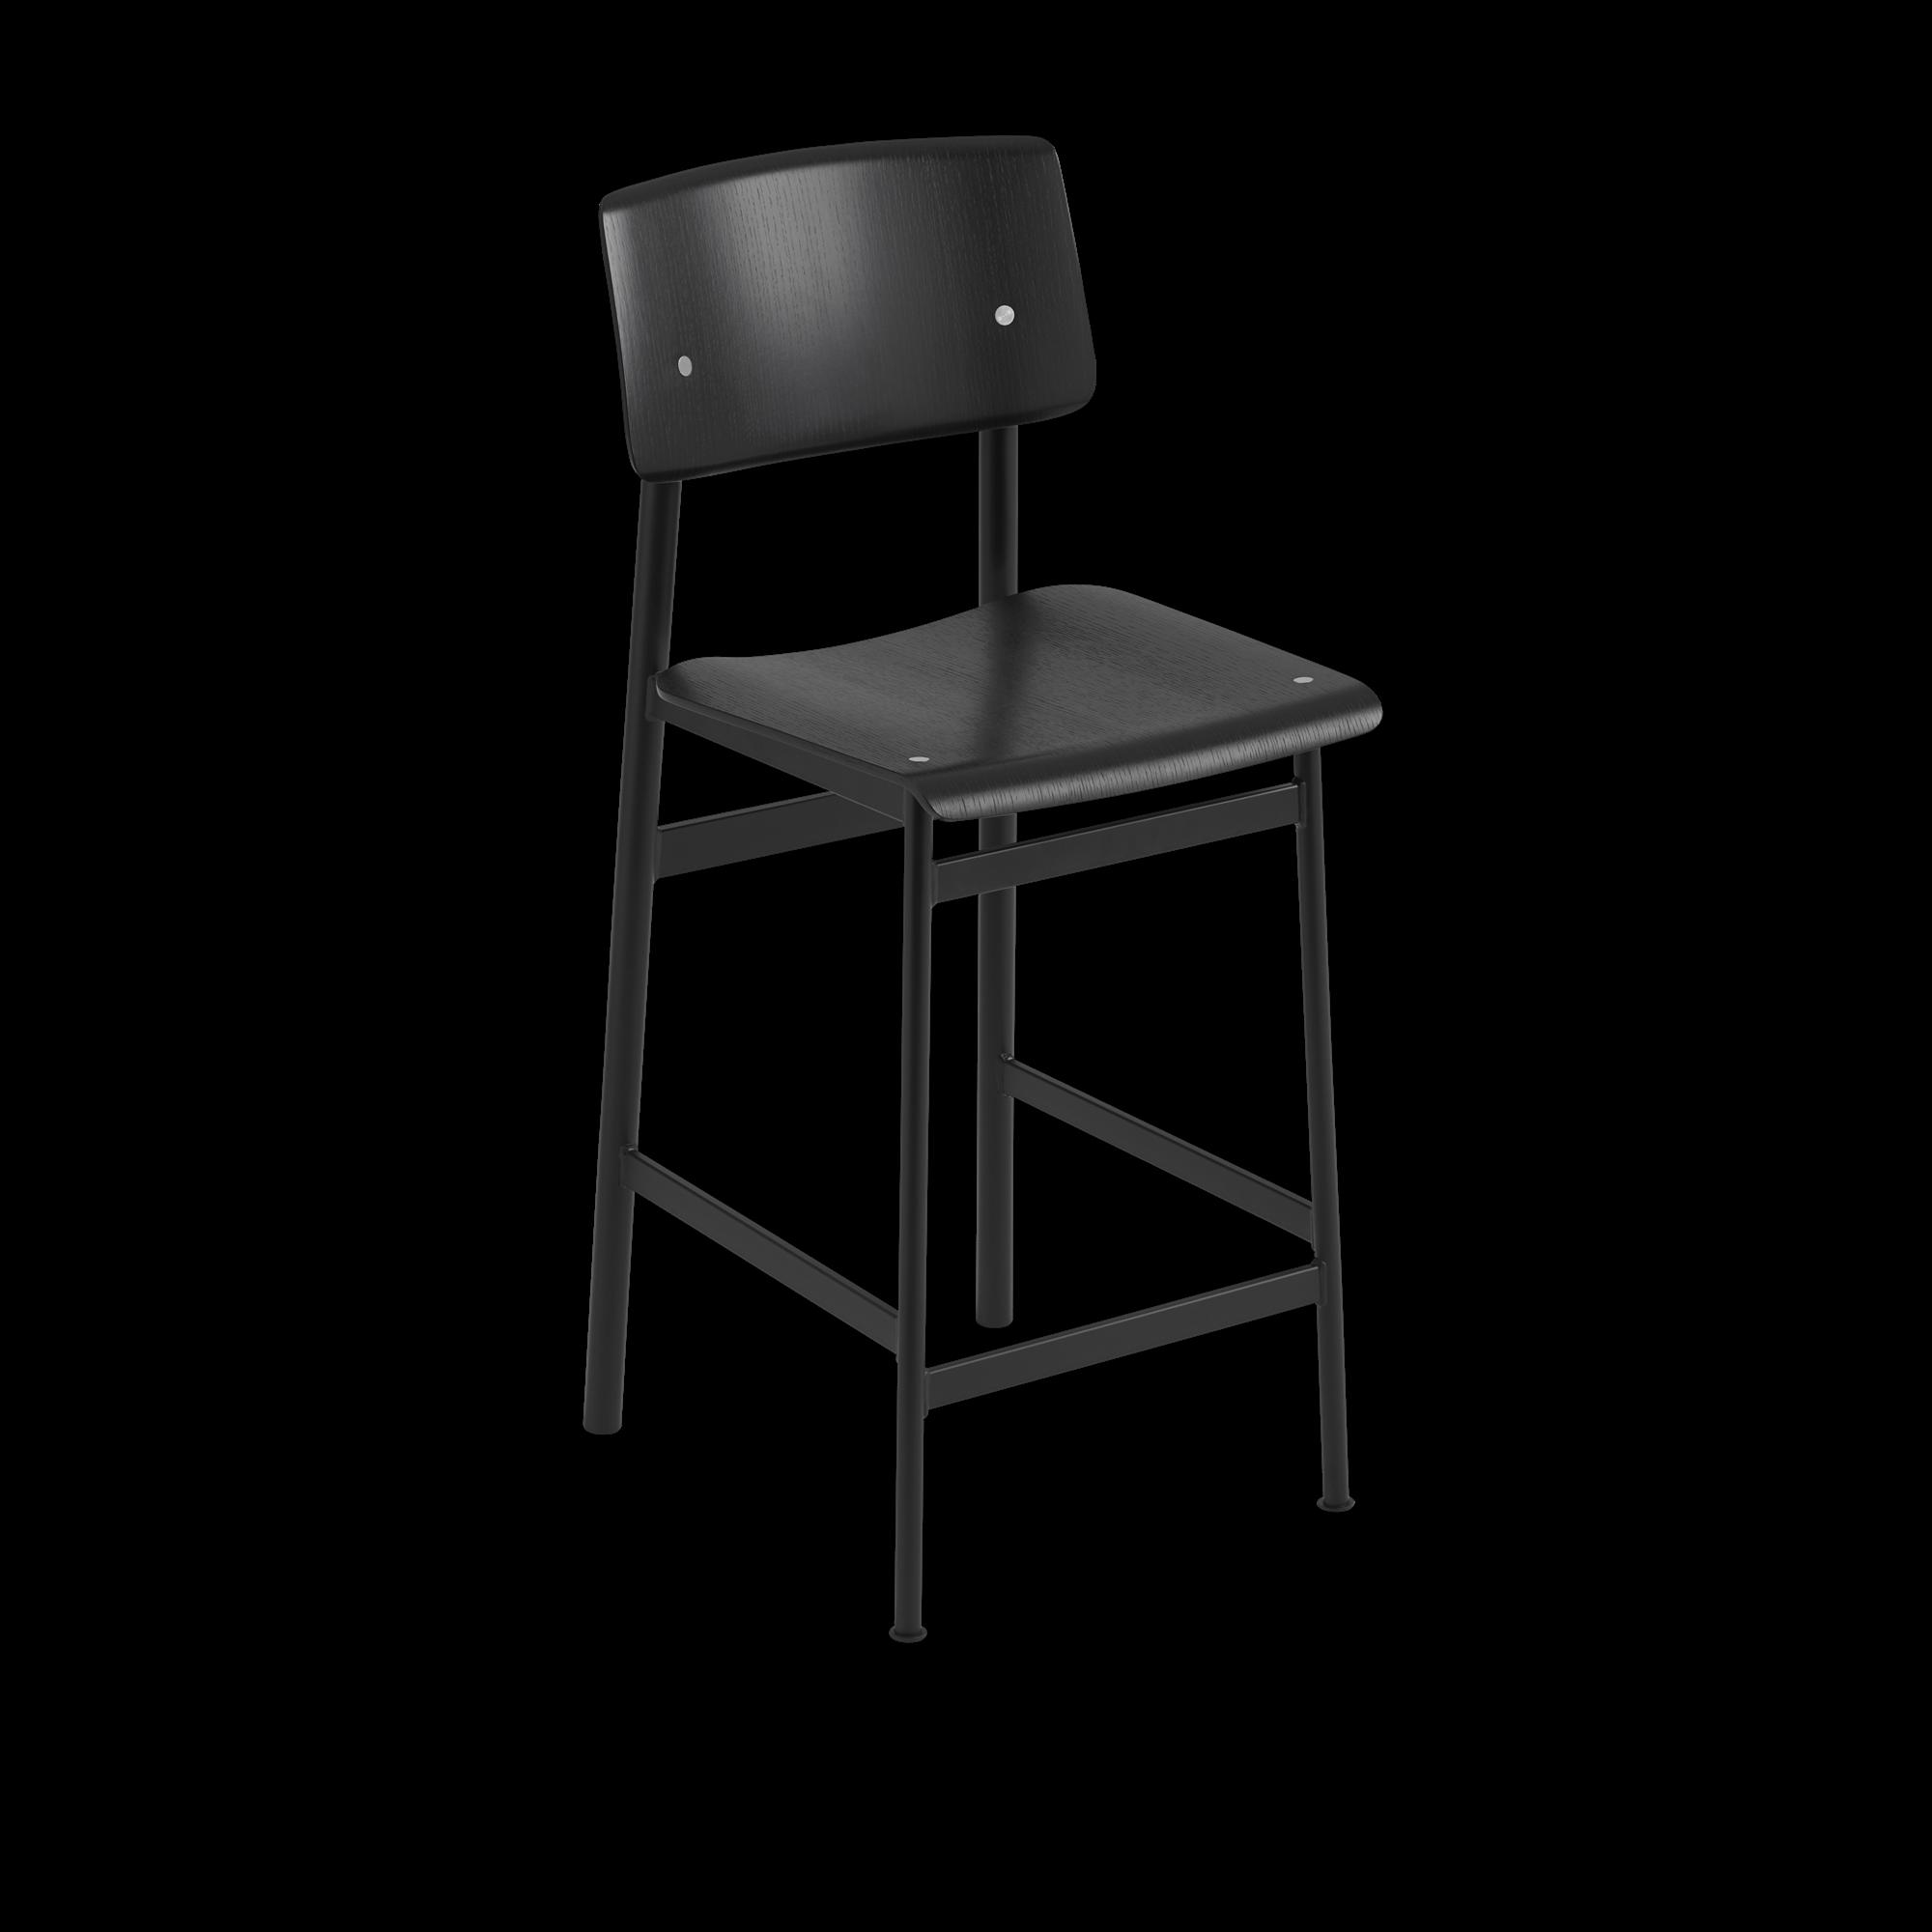 30225-loft-bar-h65-blackblack-1515593832-21340976.png